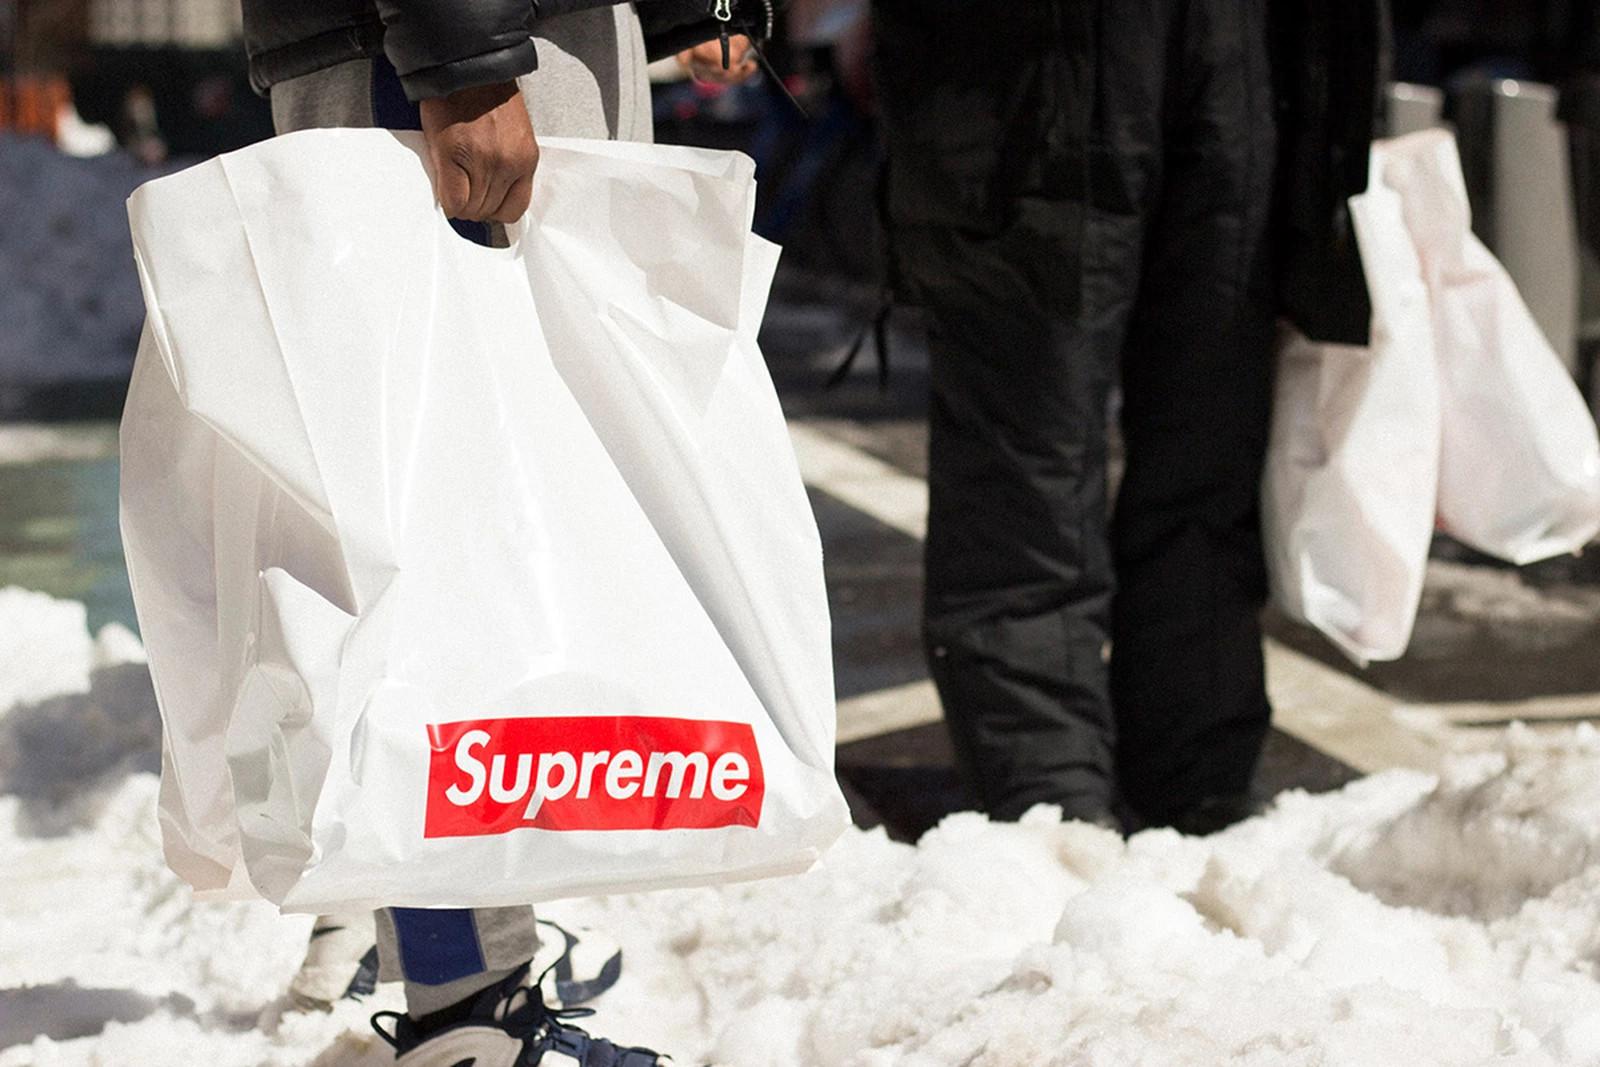 Supreme shopping